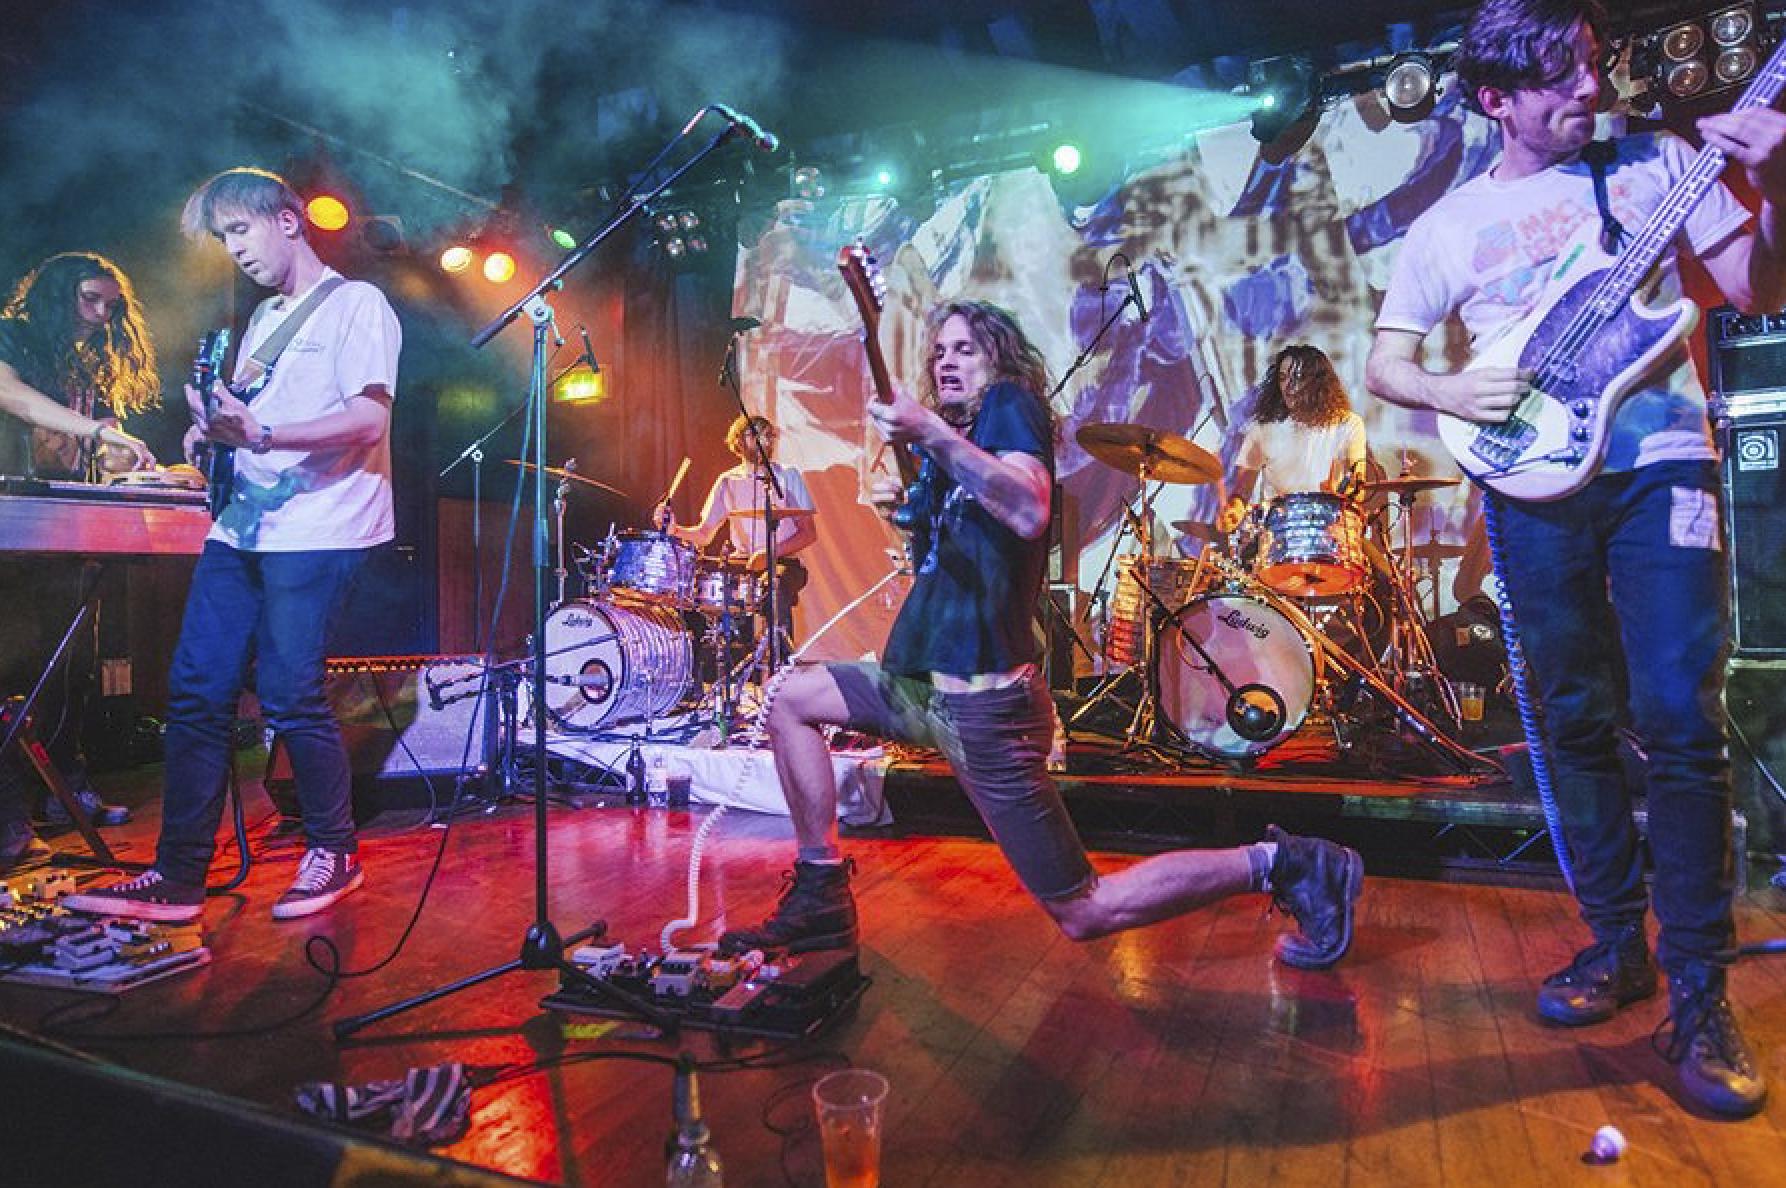 This is underground music's week to shine